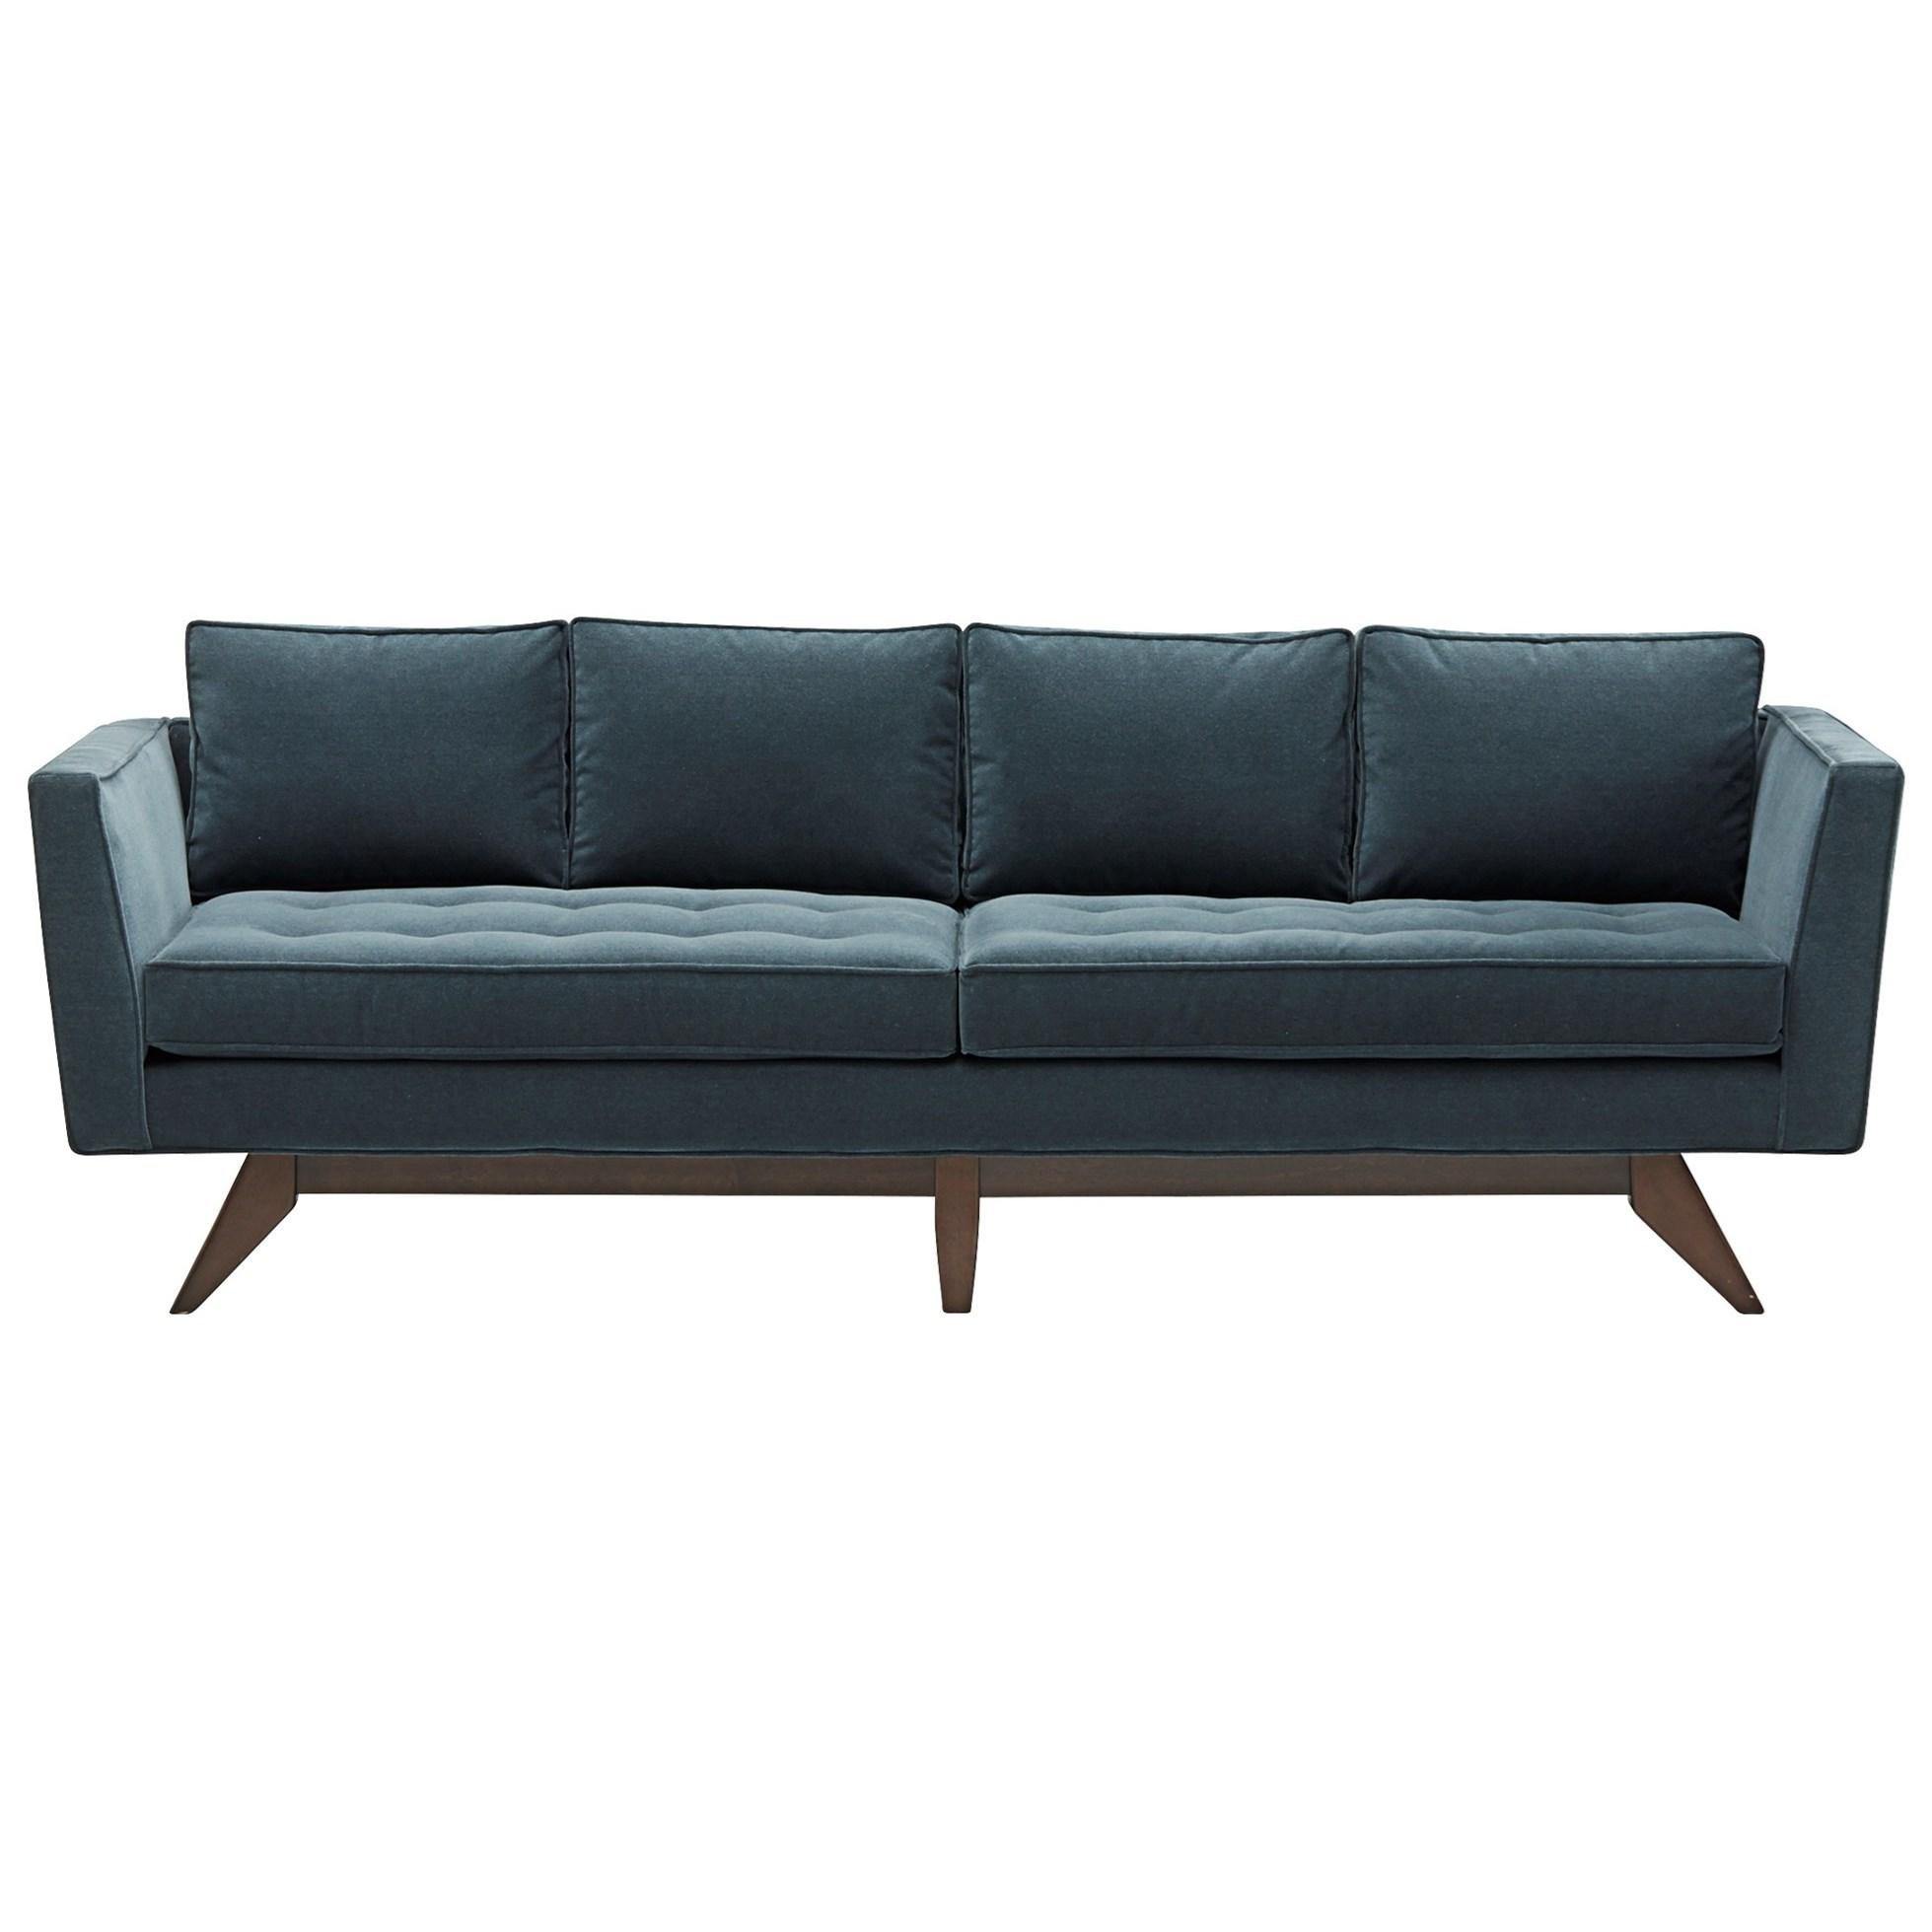 angled sofa legs gambar kartun spiderman bed inoac klaussner fairfax mid century modern style with